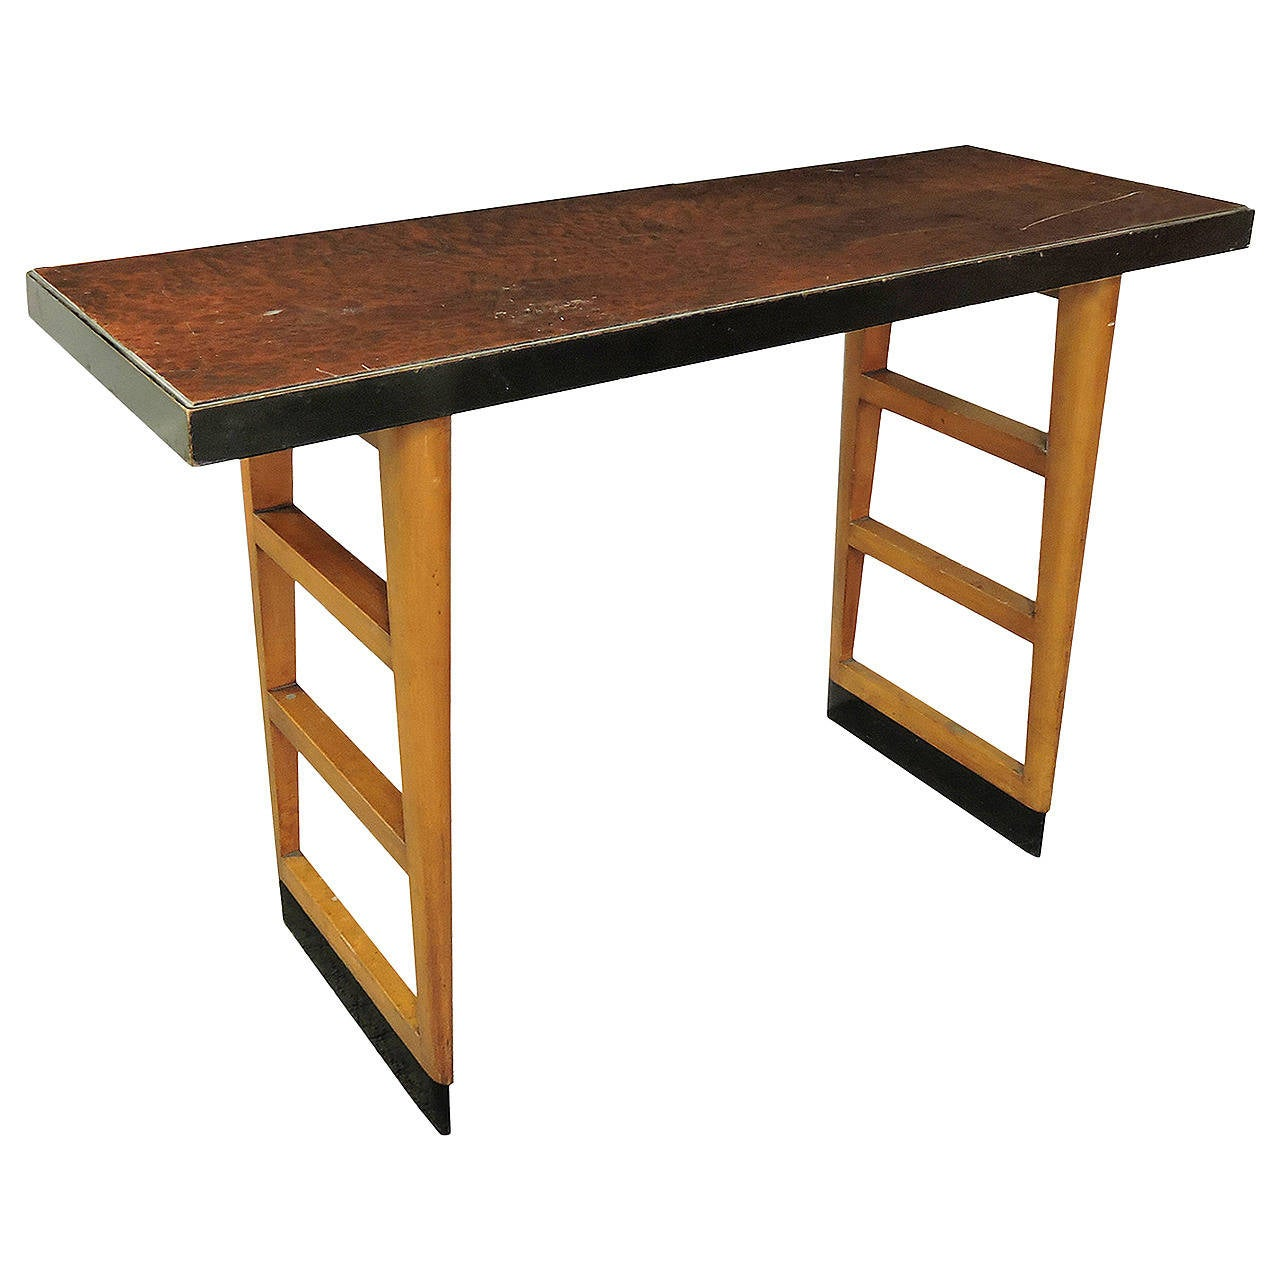 Lane Burl Wood Coffee Table: Mid-Century Modern Burl Wood Console Table At 1stdibs